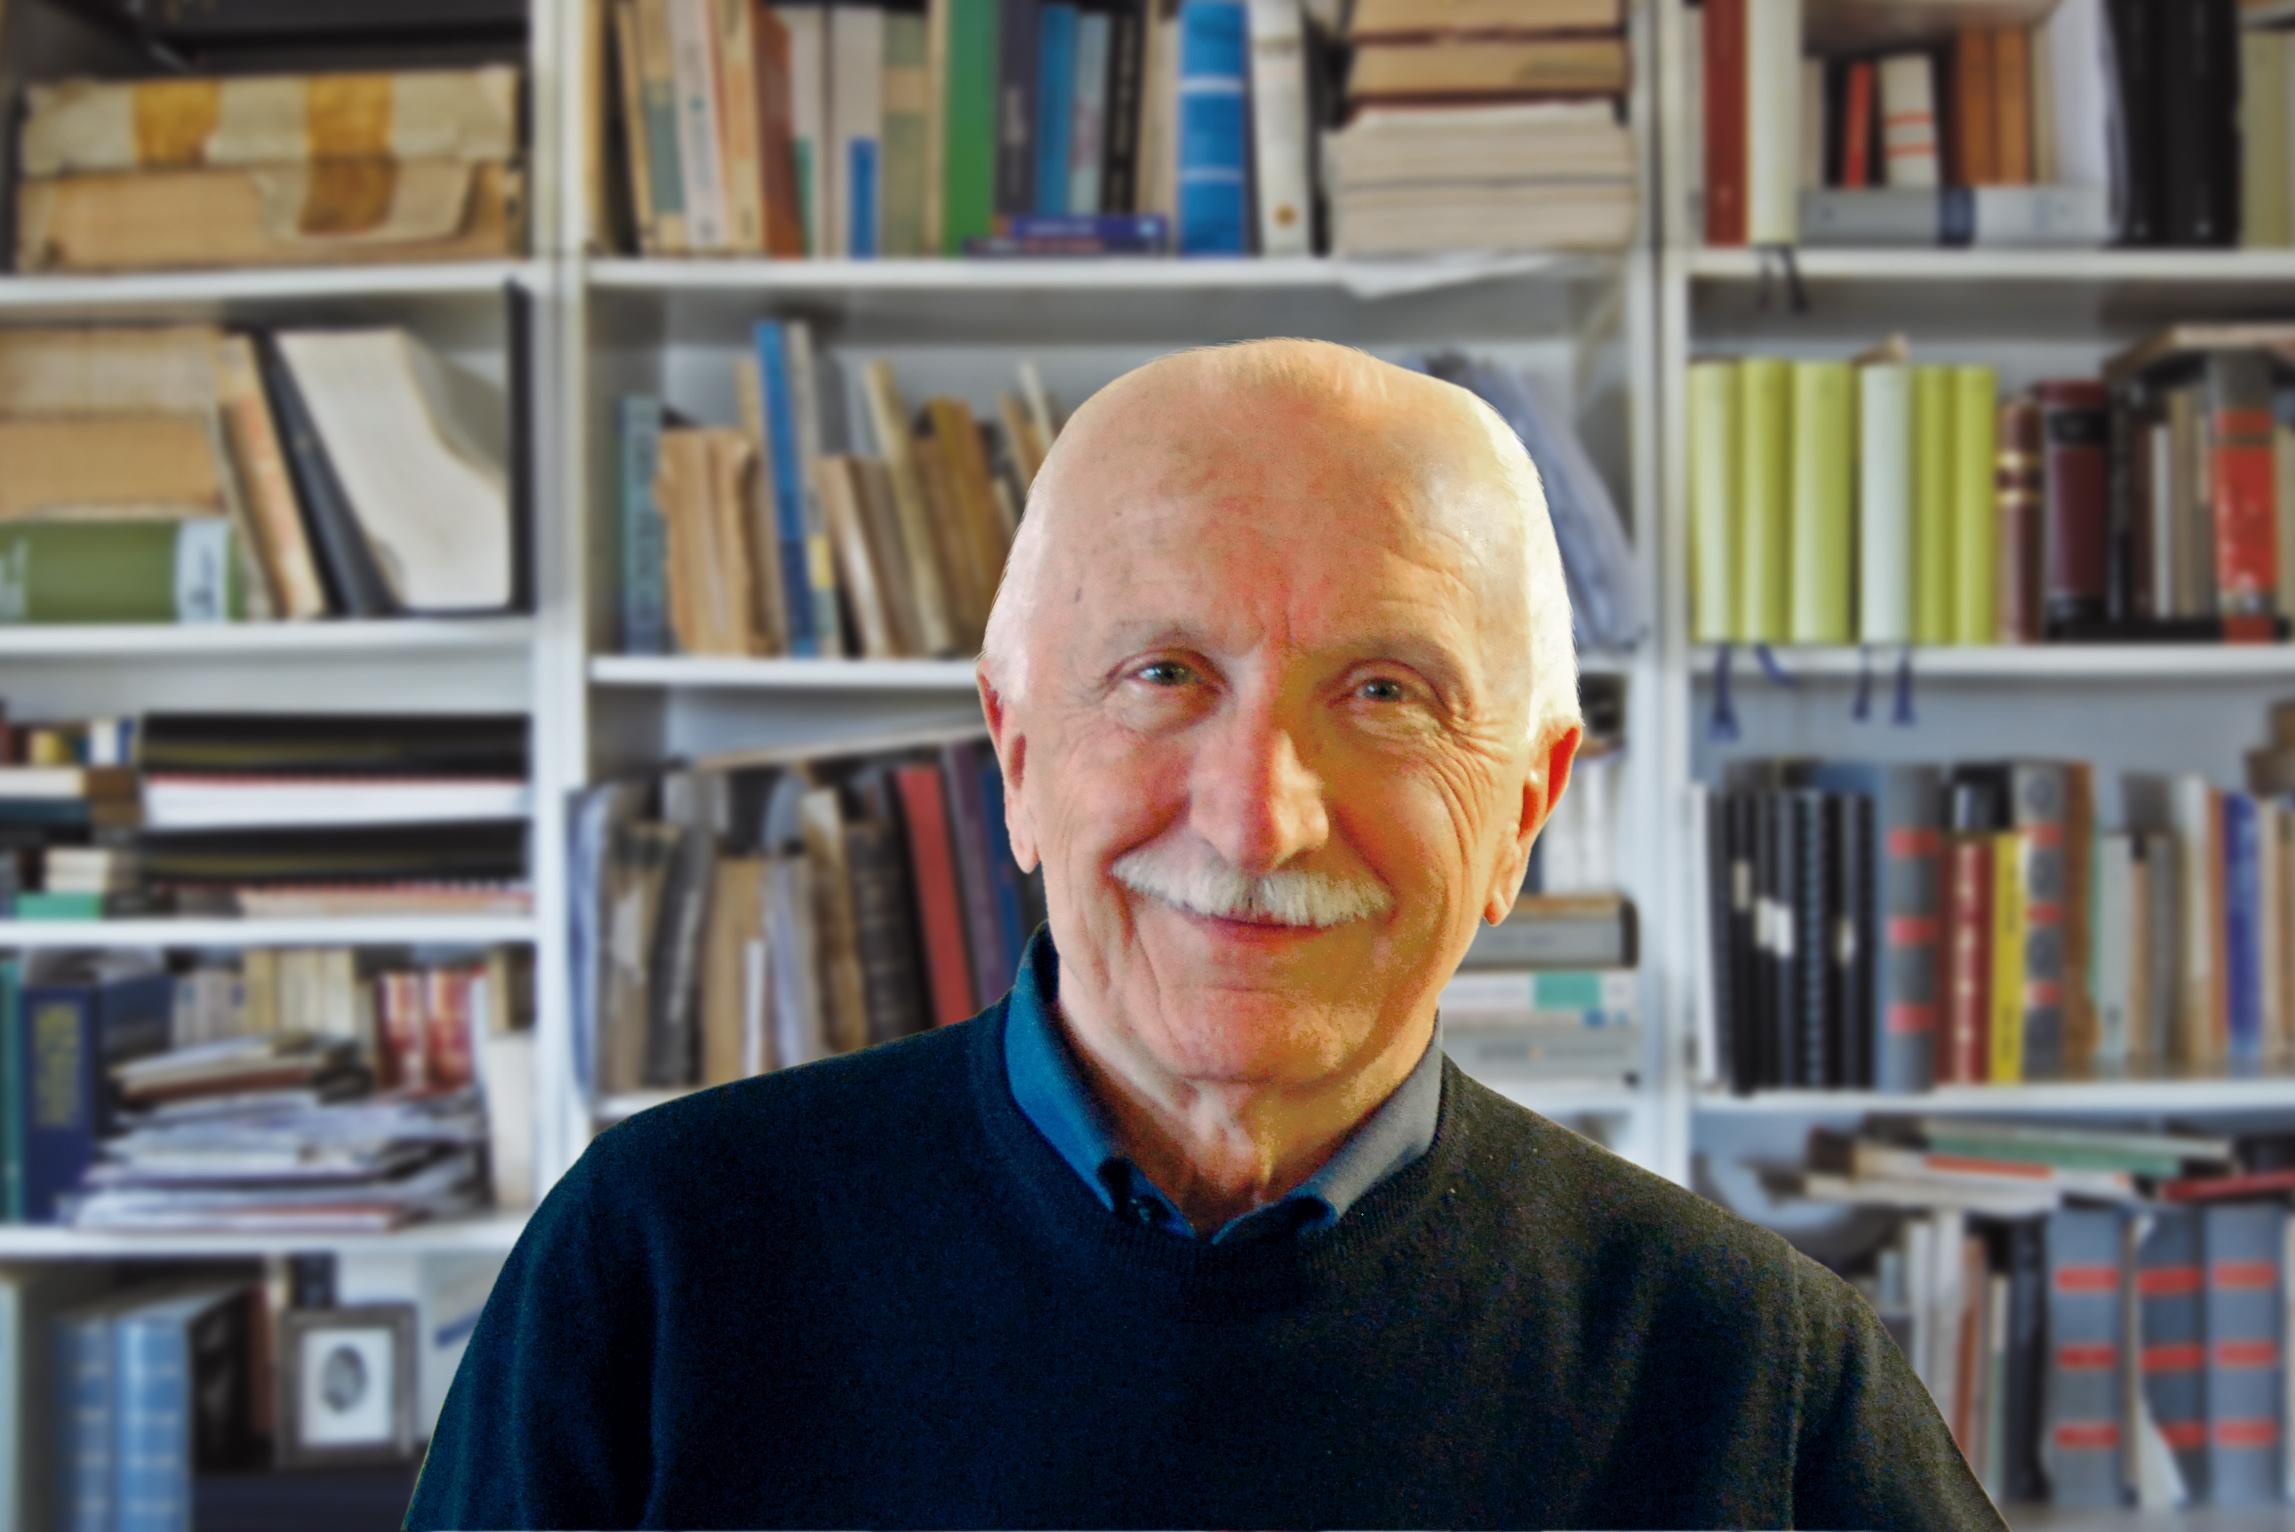 Prof. Ezio Mancino